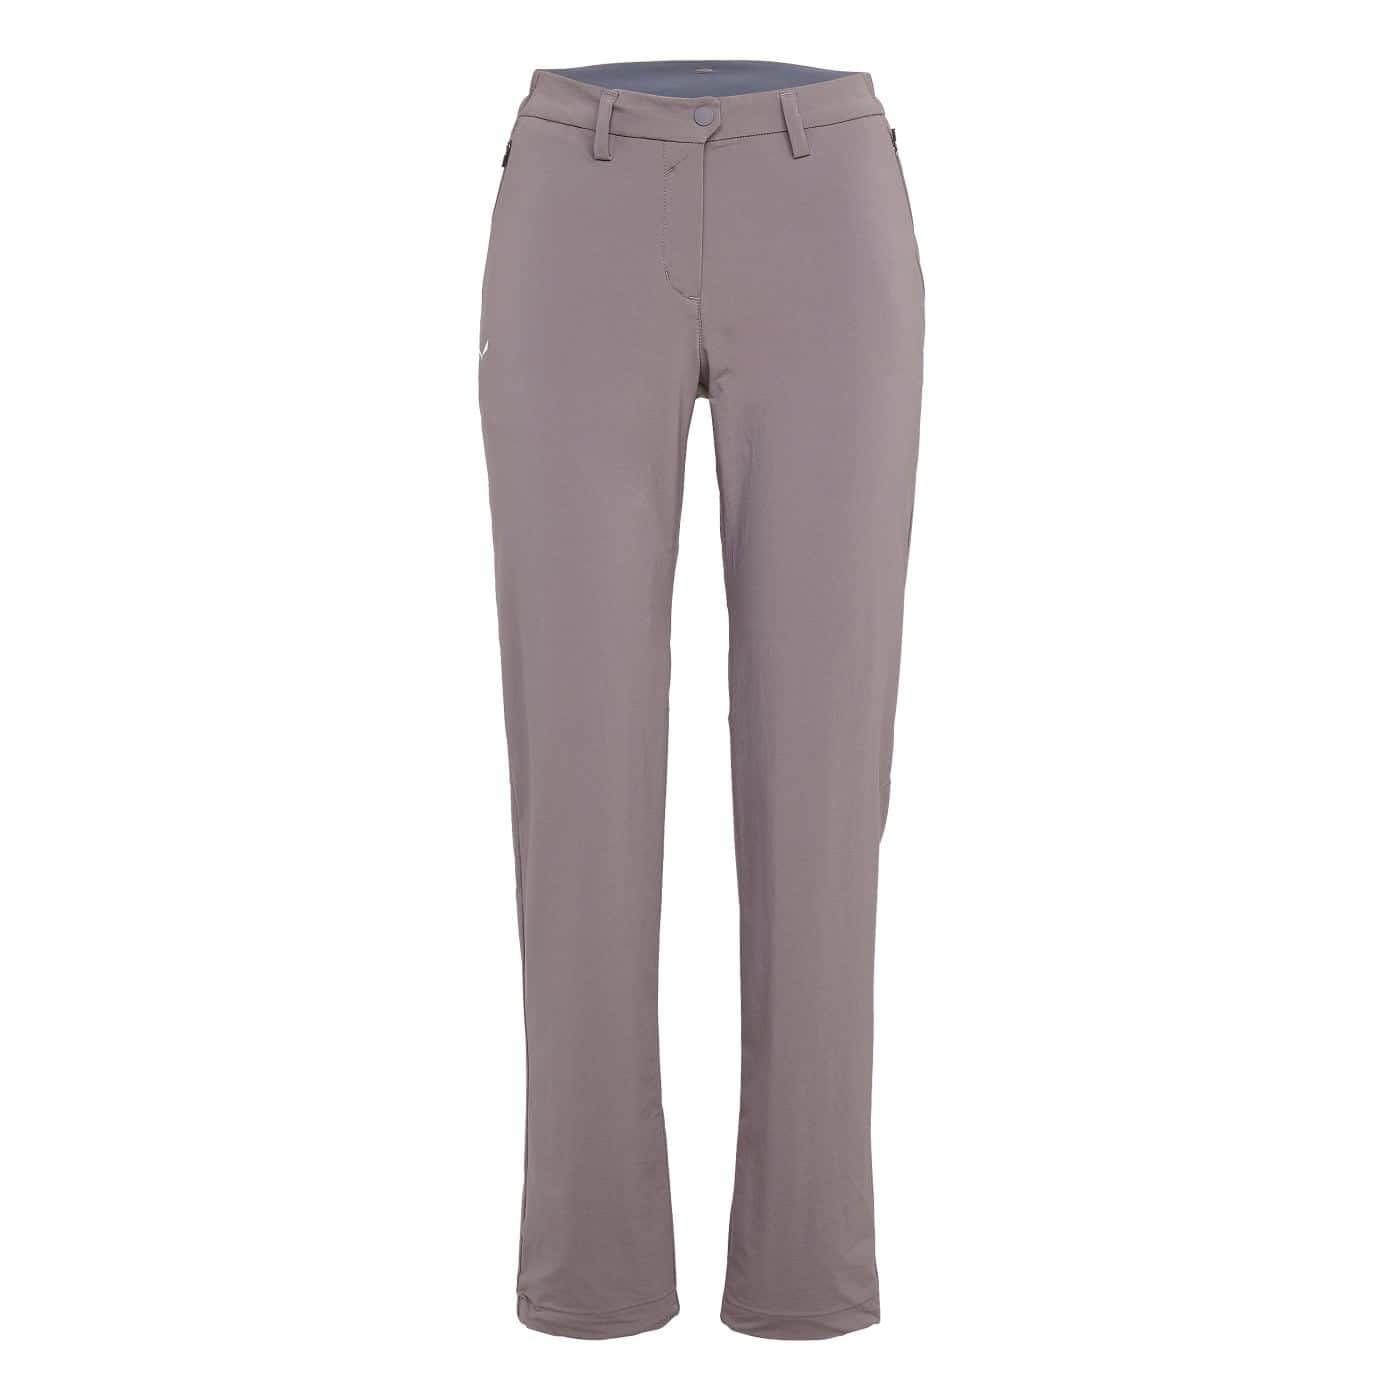 Salewa-Puez 2 DST Regular Pant - Women's